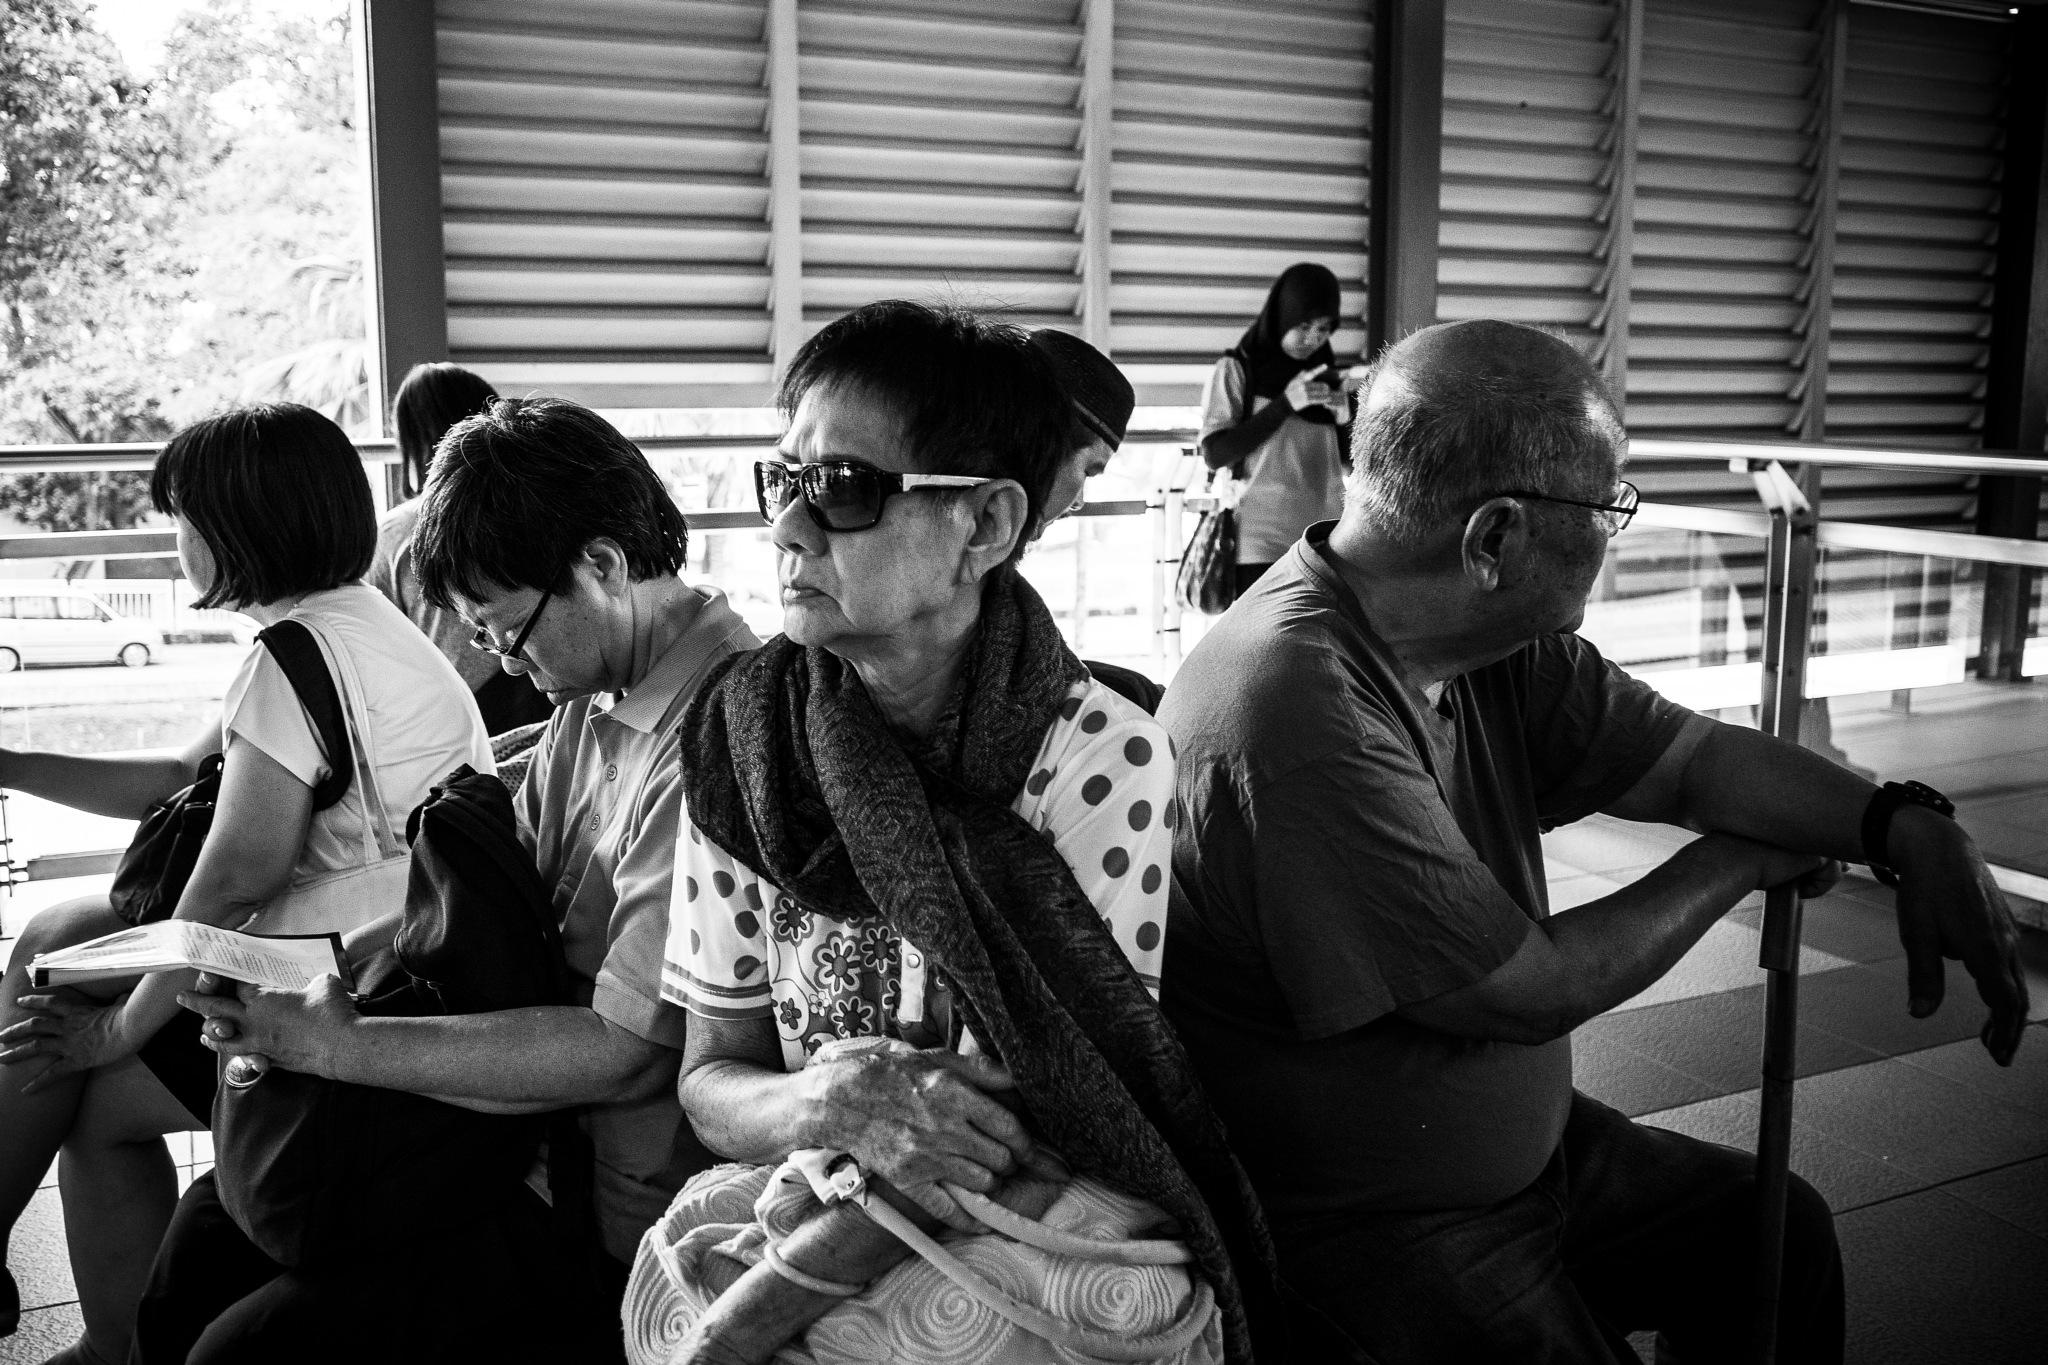 The View of Life, Kuala Lumpur by Aizad Fadzli